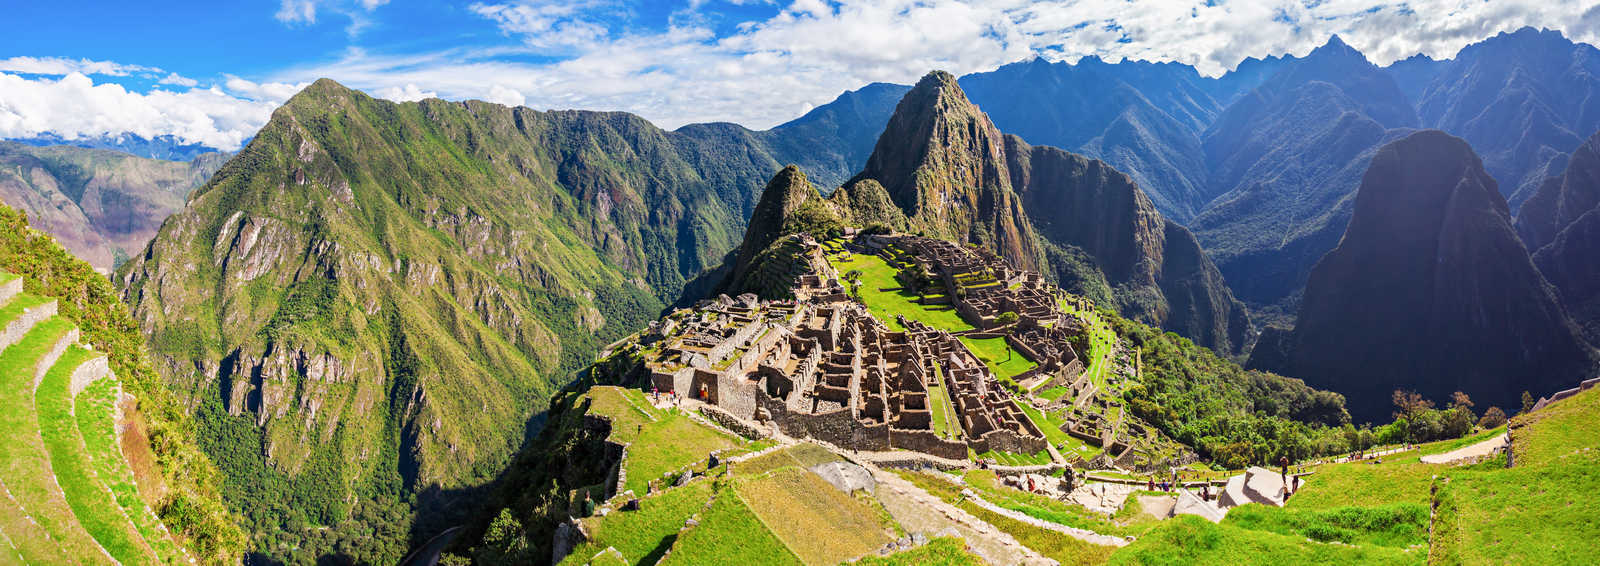 Machu Picchu, one of the New Seven Wonders of the World, Peru